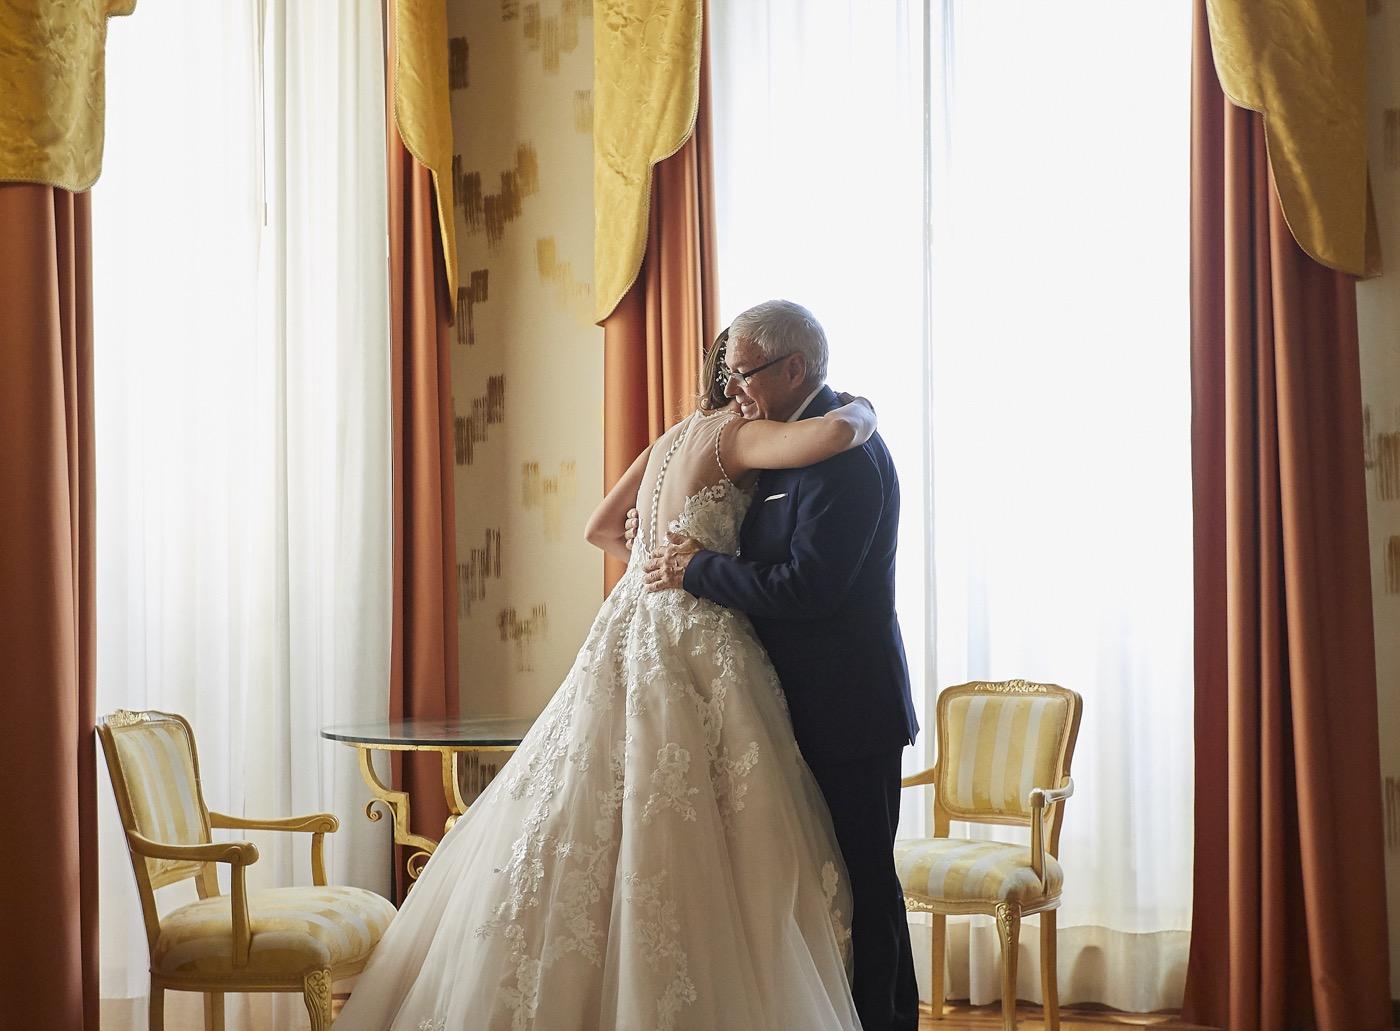 Claudio-Coppola-wedding-photographer-la-scuderia-eventi-preparativi-la-rosetta-perugia-26